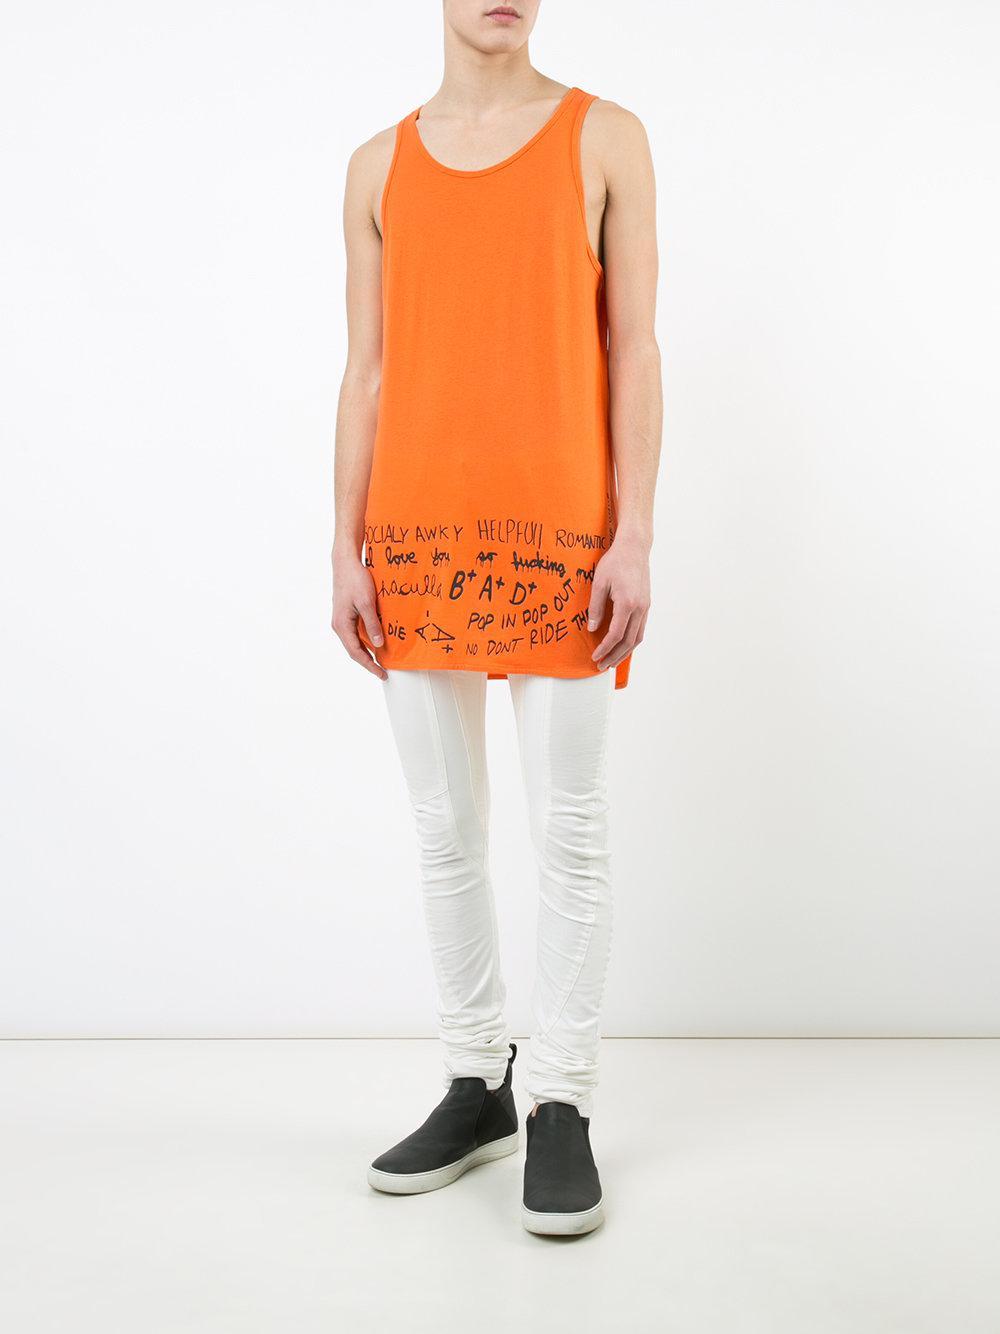 Haculla Cotton Handwriting Print Top in Yellow & Orange (Orange) for Men